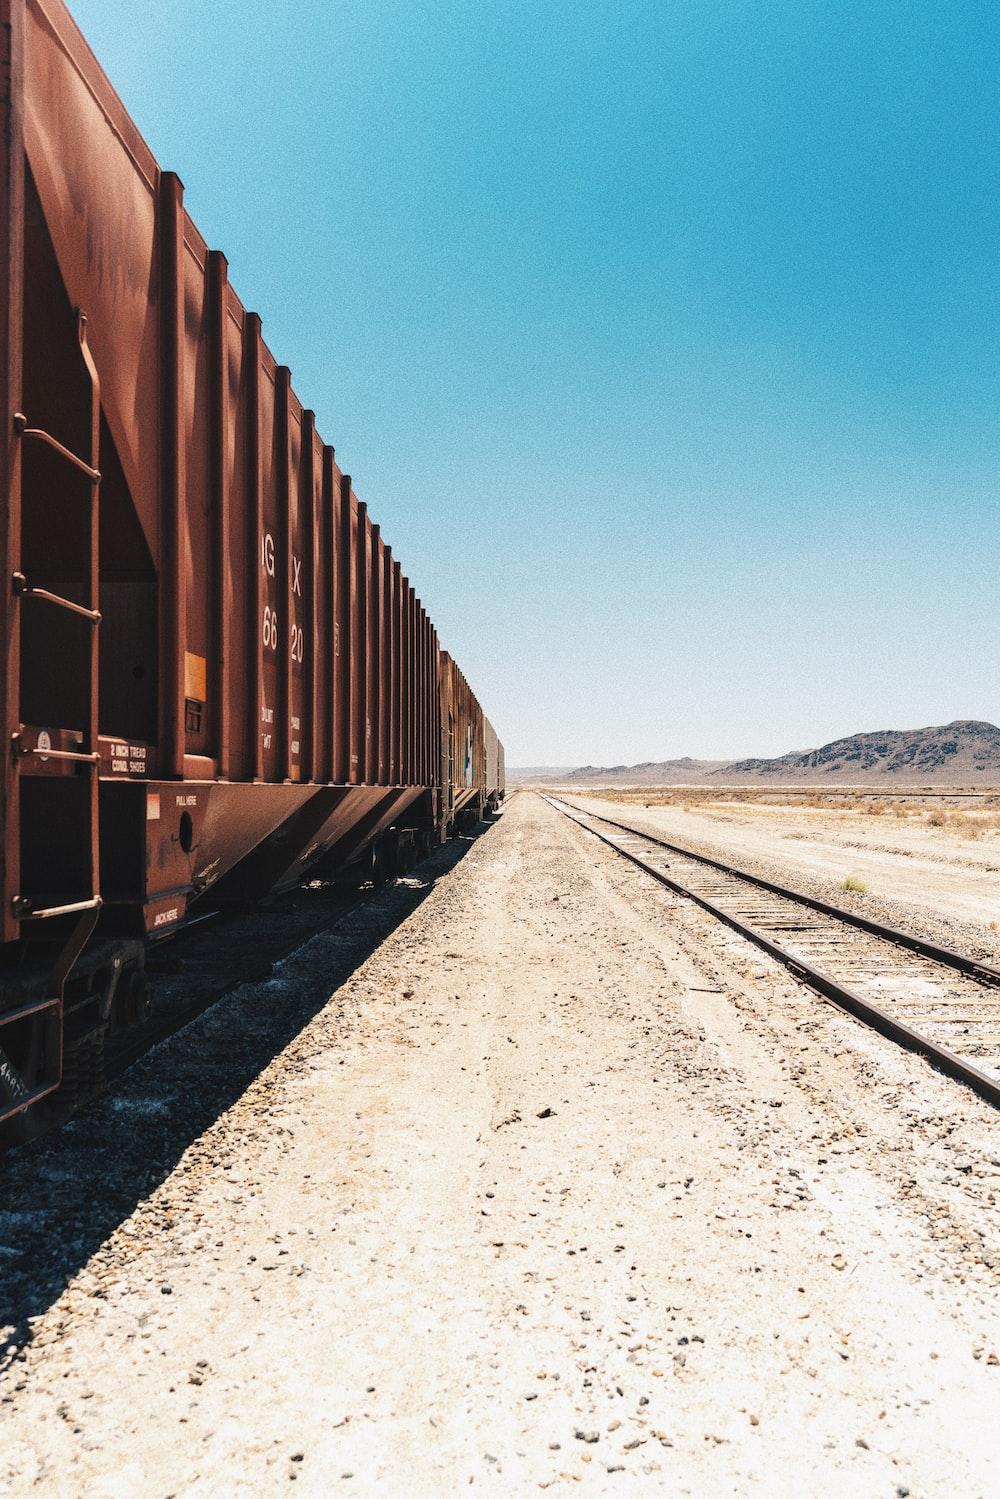 brown train on rail during daytime